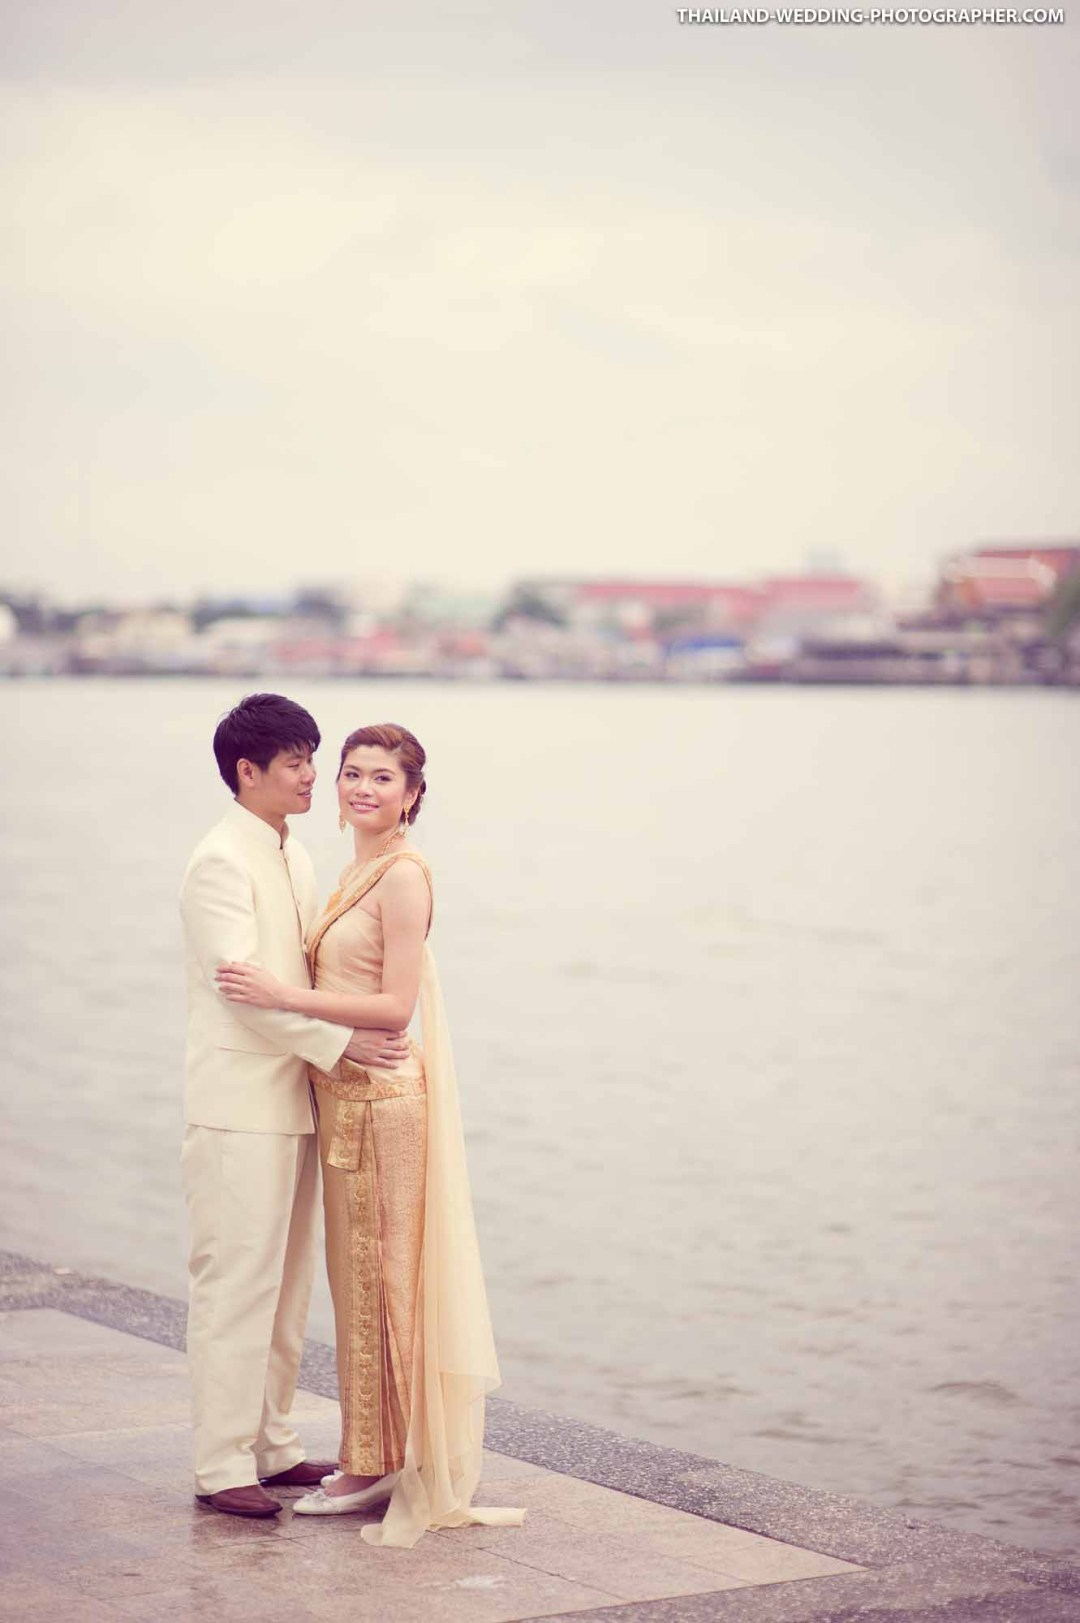 Rama 8 Bridge Bangkok Thailand Prenuptial (Engagement Session, Pre-Wedding)